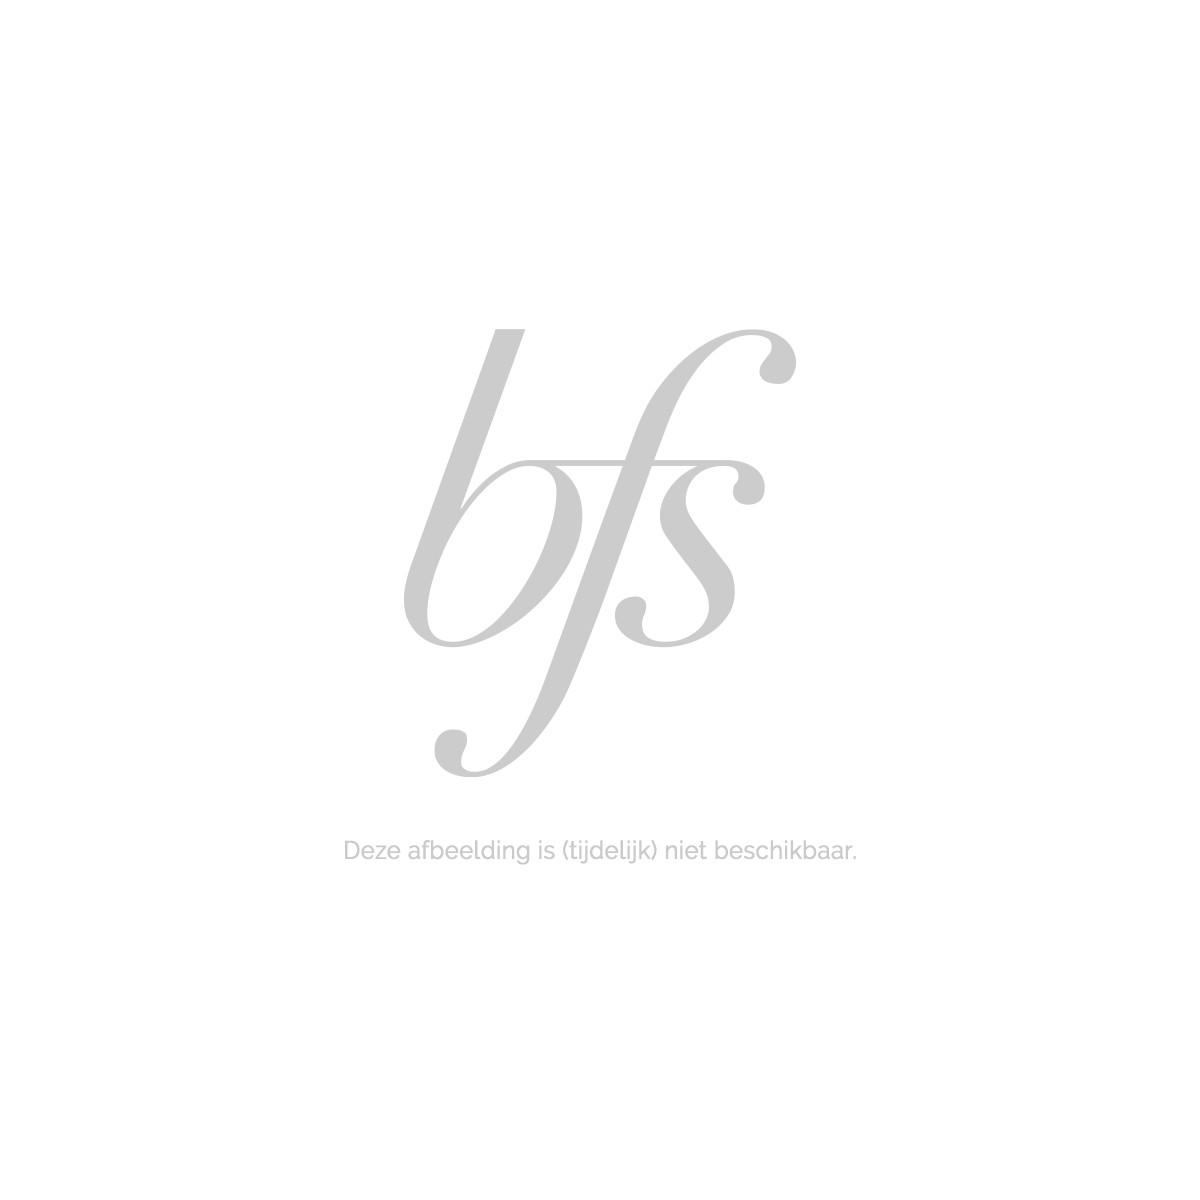 Yves Saint Laurent Mascara Vol. Eff. Faux Cils Bl. Lux.Waterproof 6,90 Ml